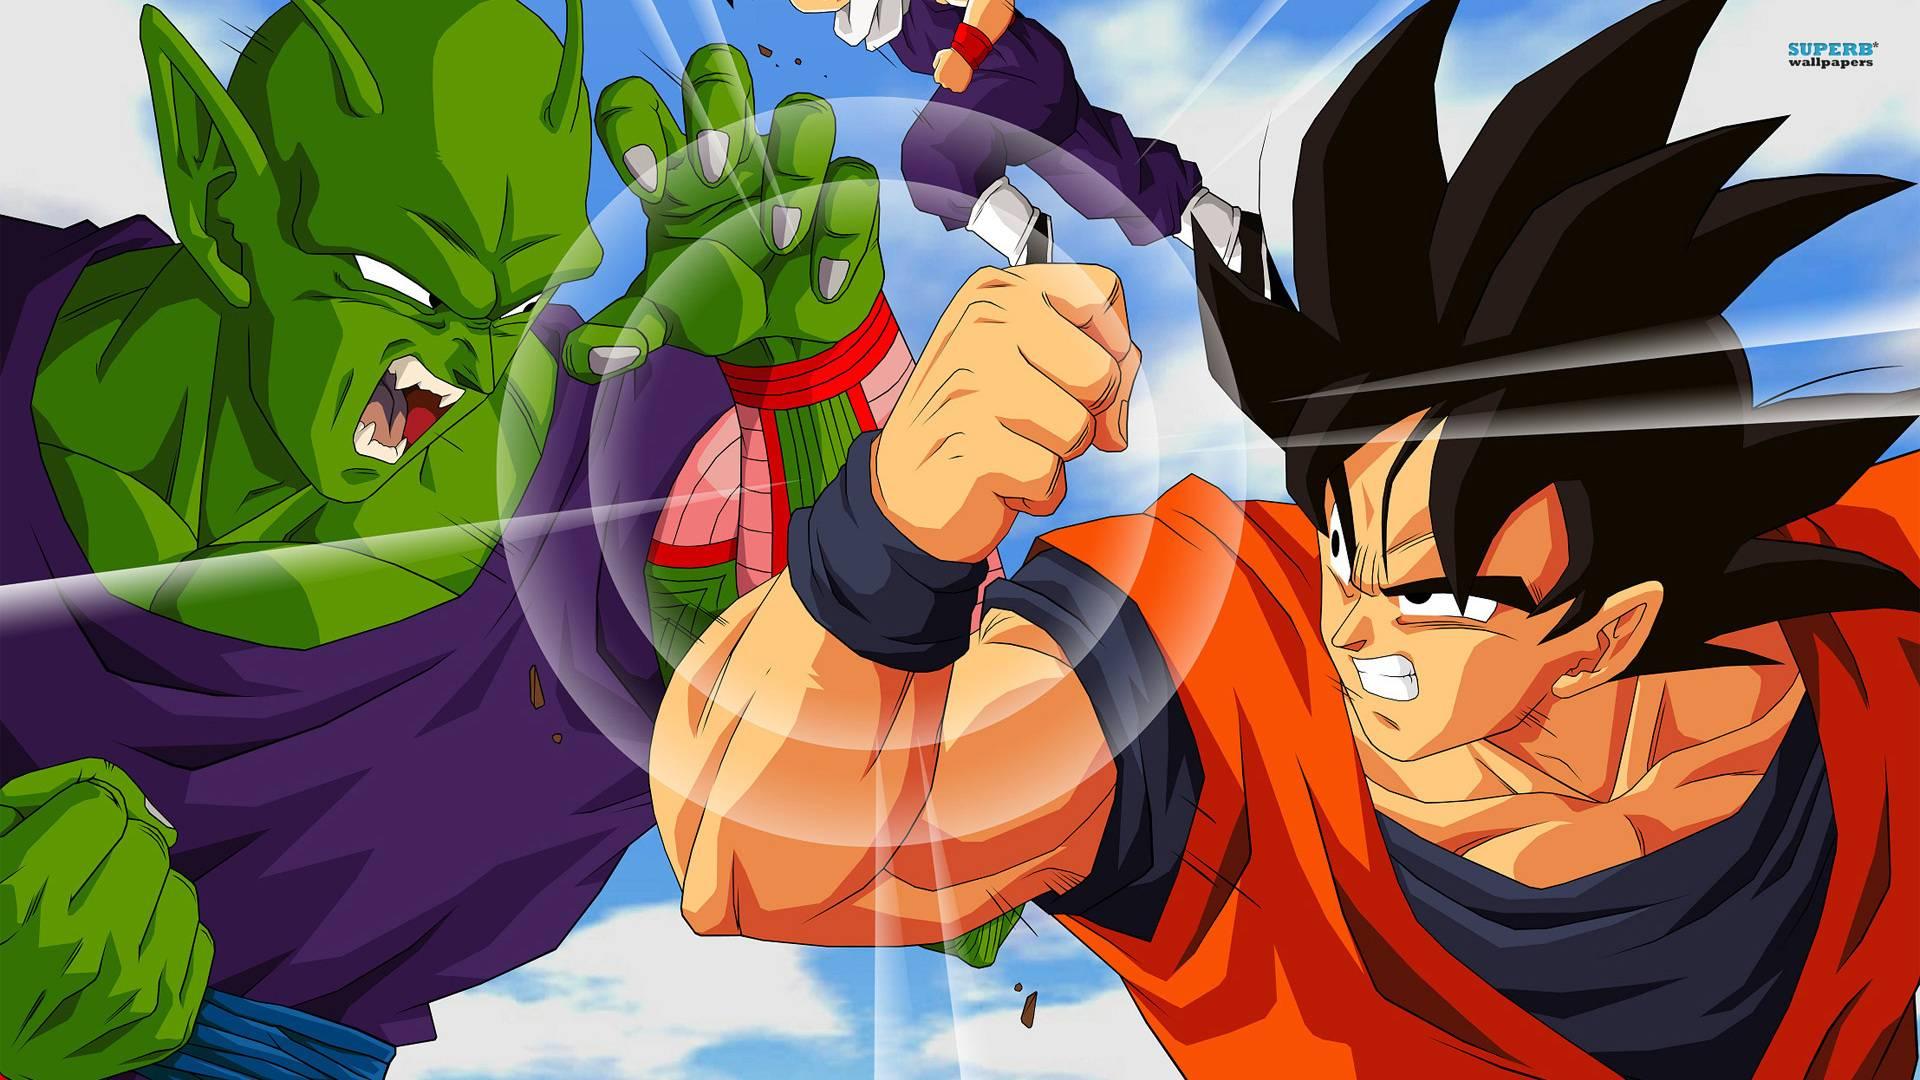 Goku vs Piccolo Goku vs Piccolo 1920x1080